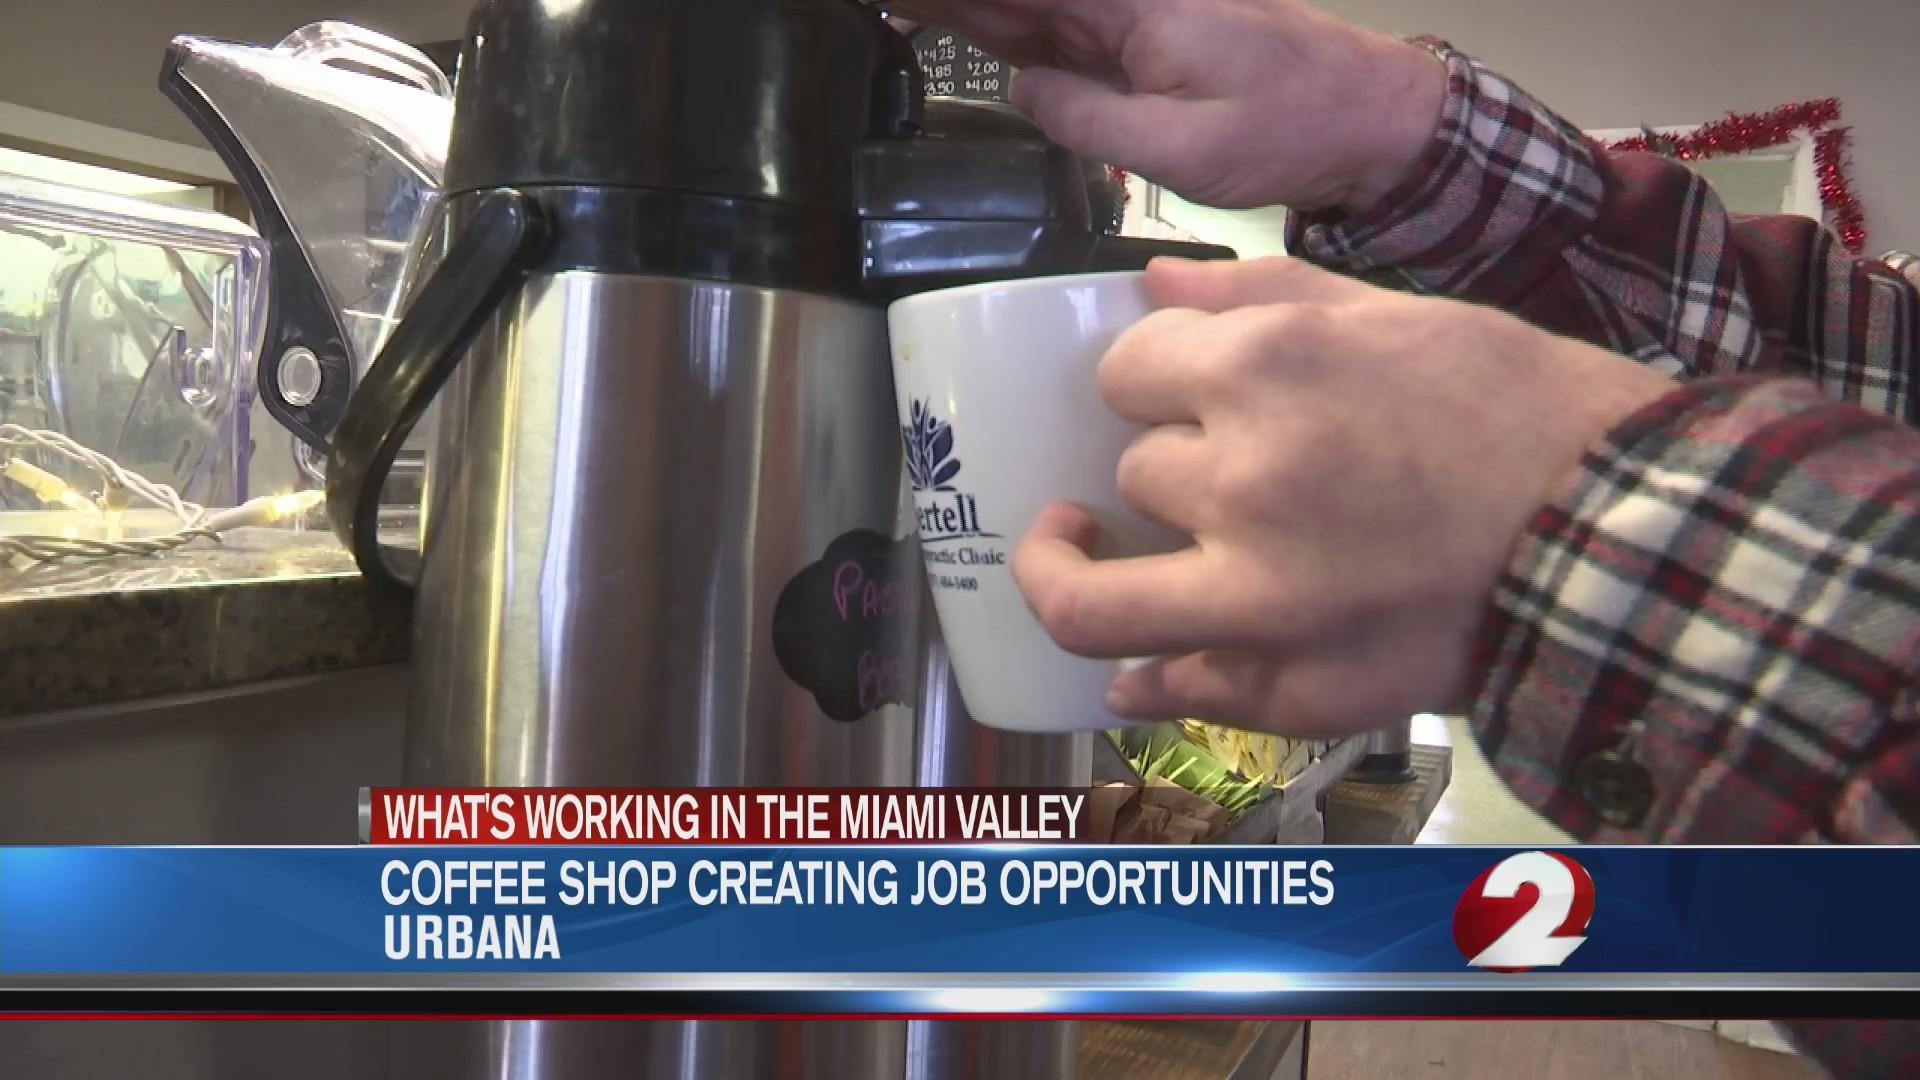 Coffee shop creating job opportunities